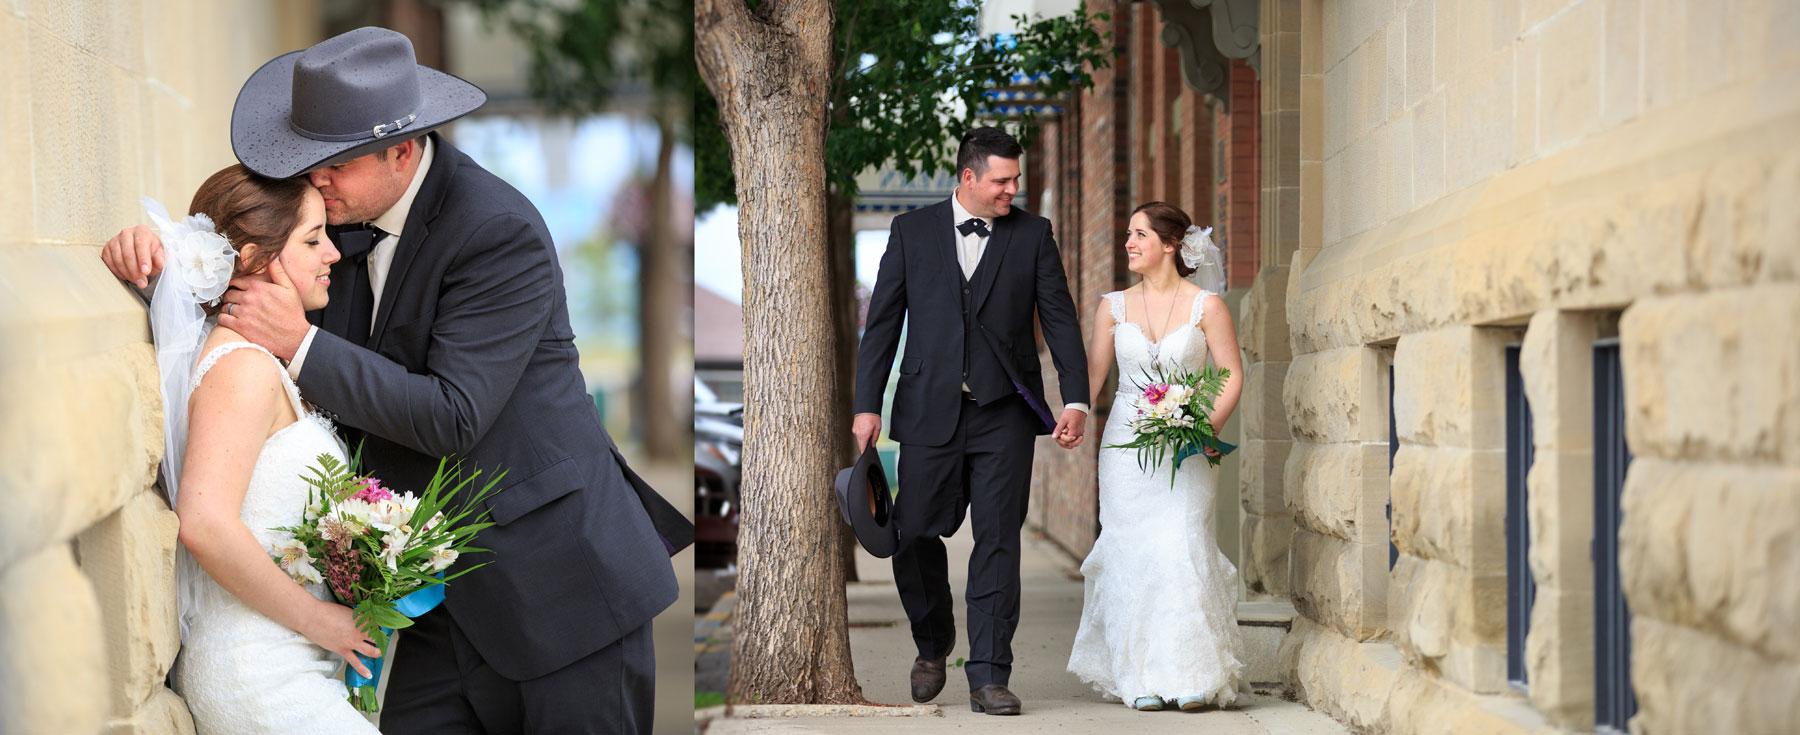 Angela & Patrick - Lacombe, Alberta Wedding Photography - Olson Studios (20)